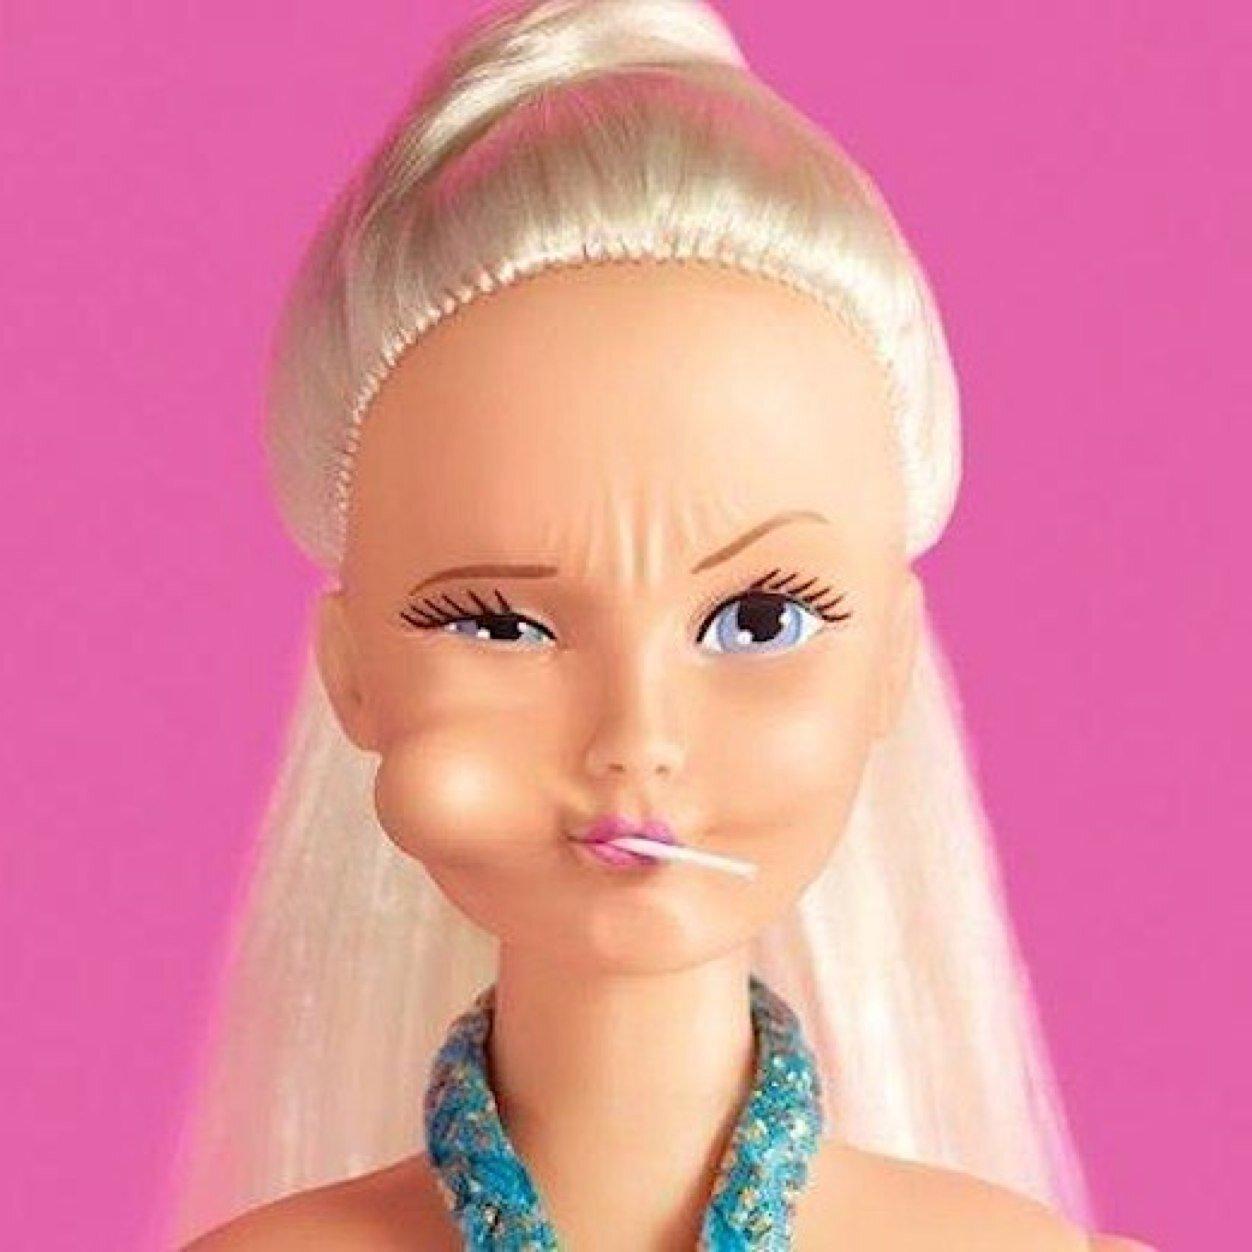 Barbie Wallpaper Tumblr: Bad Bitch Barbie (@BadTrickBarbie)